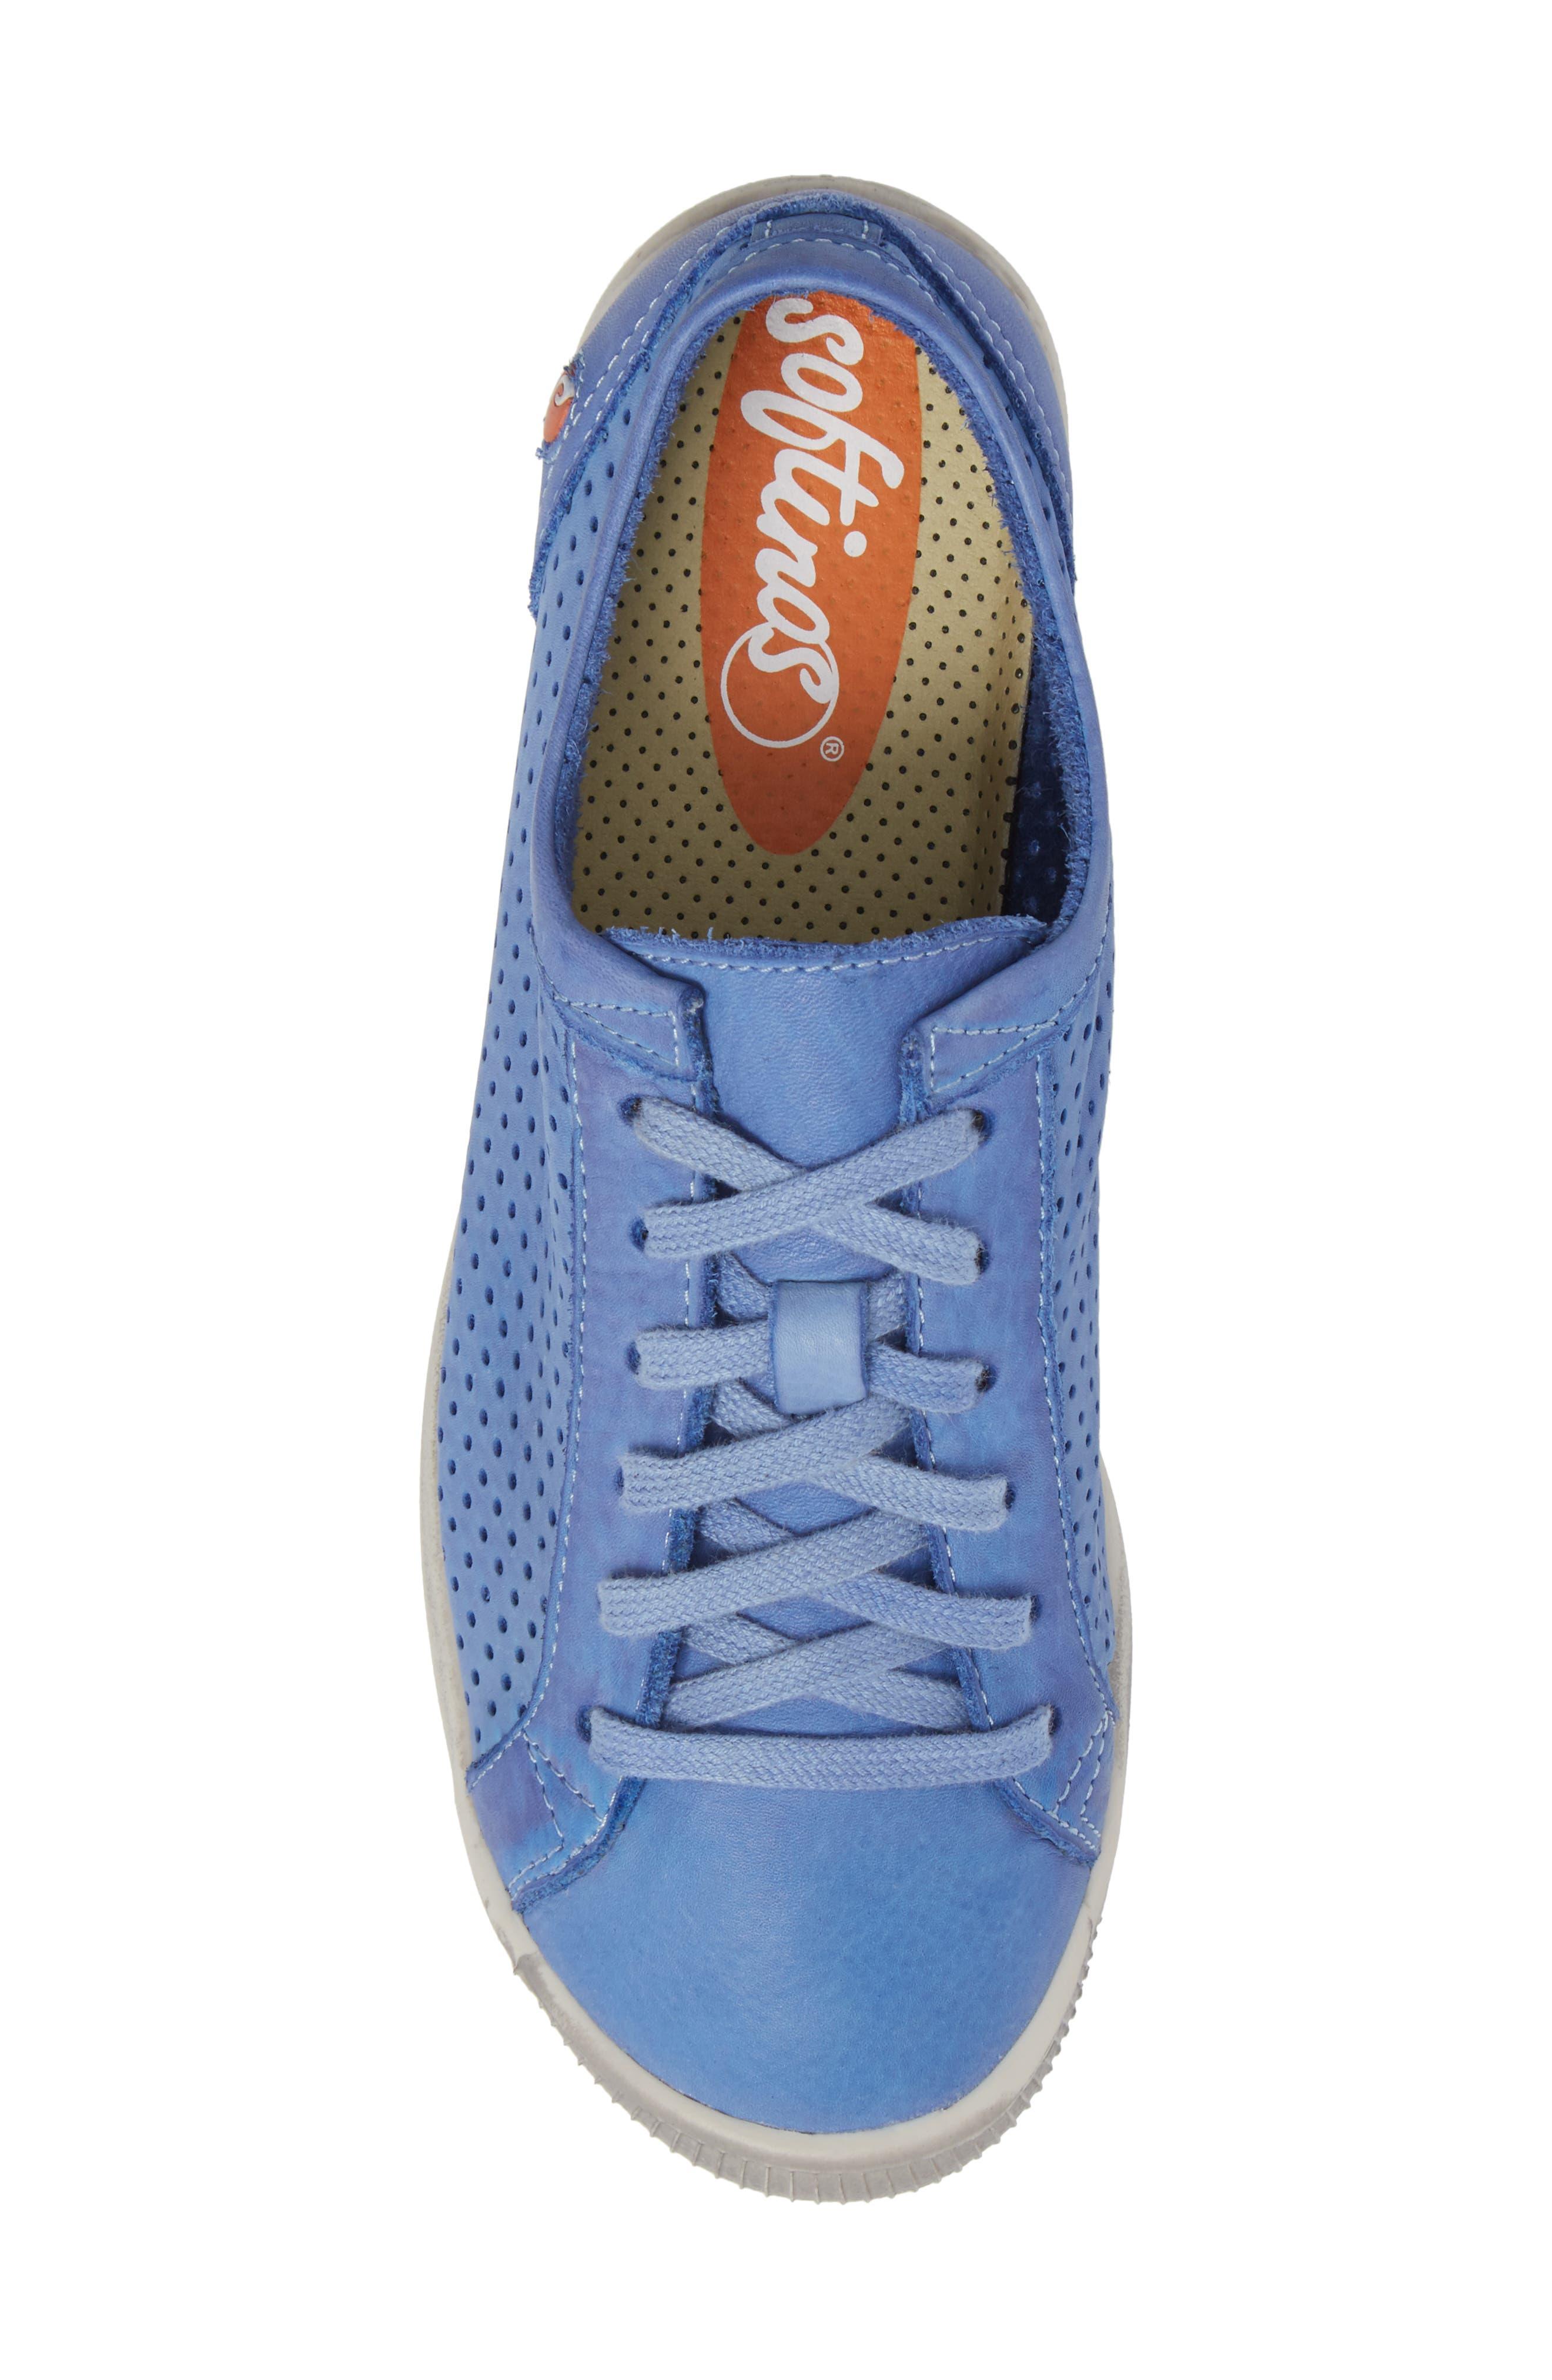 Ica Sneaker,                             Alternate thumbnail 35, color,